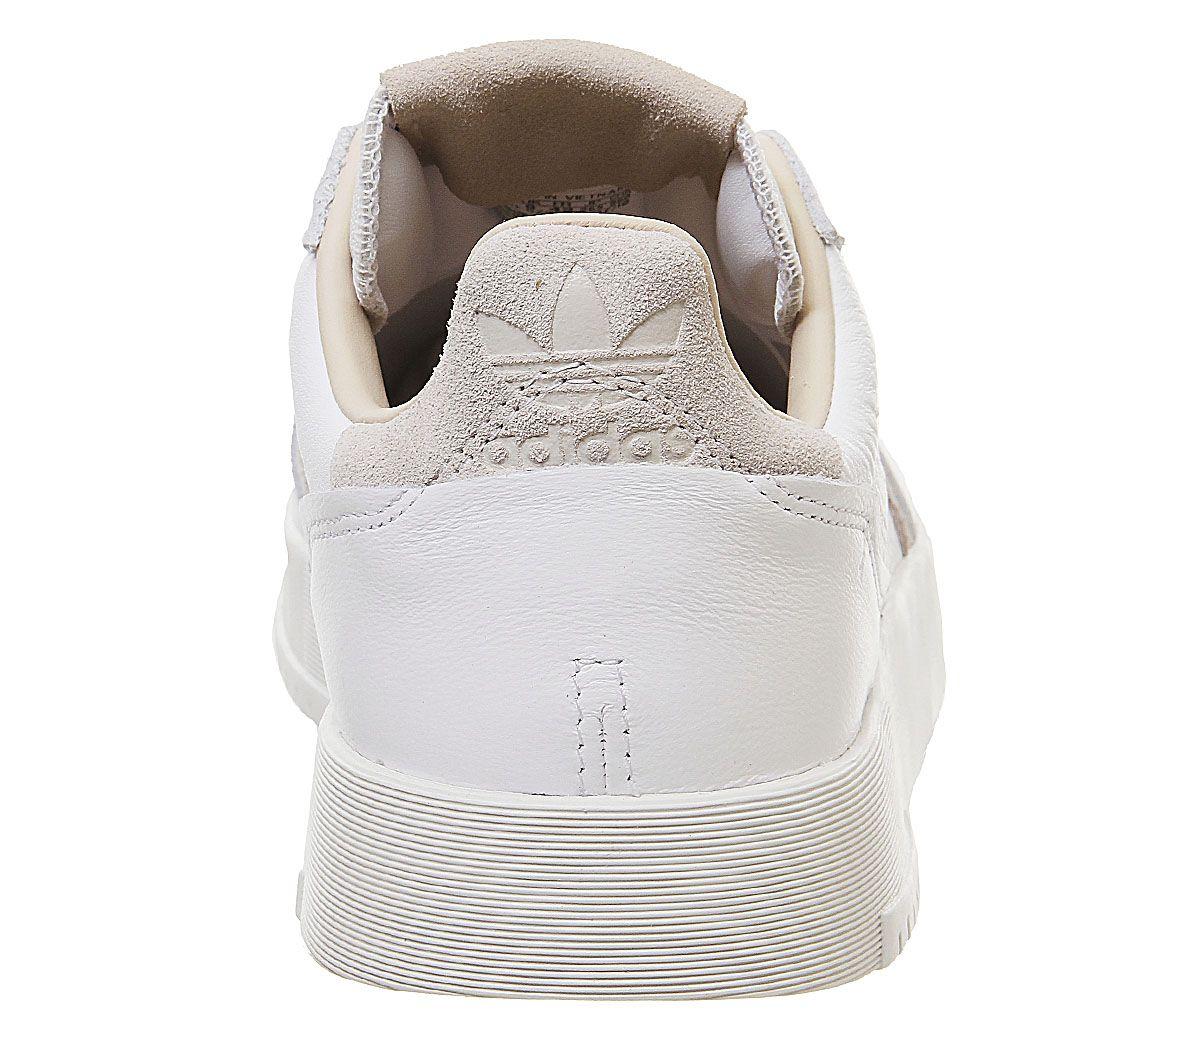 Adidas-Supercourt-Baskets-Blanc-Cristal-Blanc-Baskets-Chaussures miniature 4